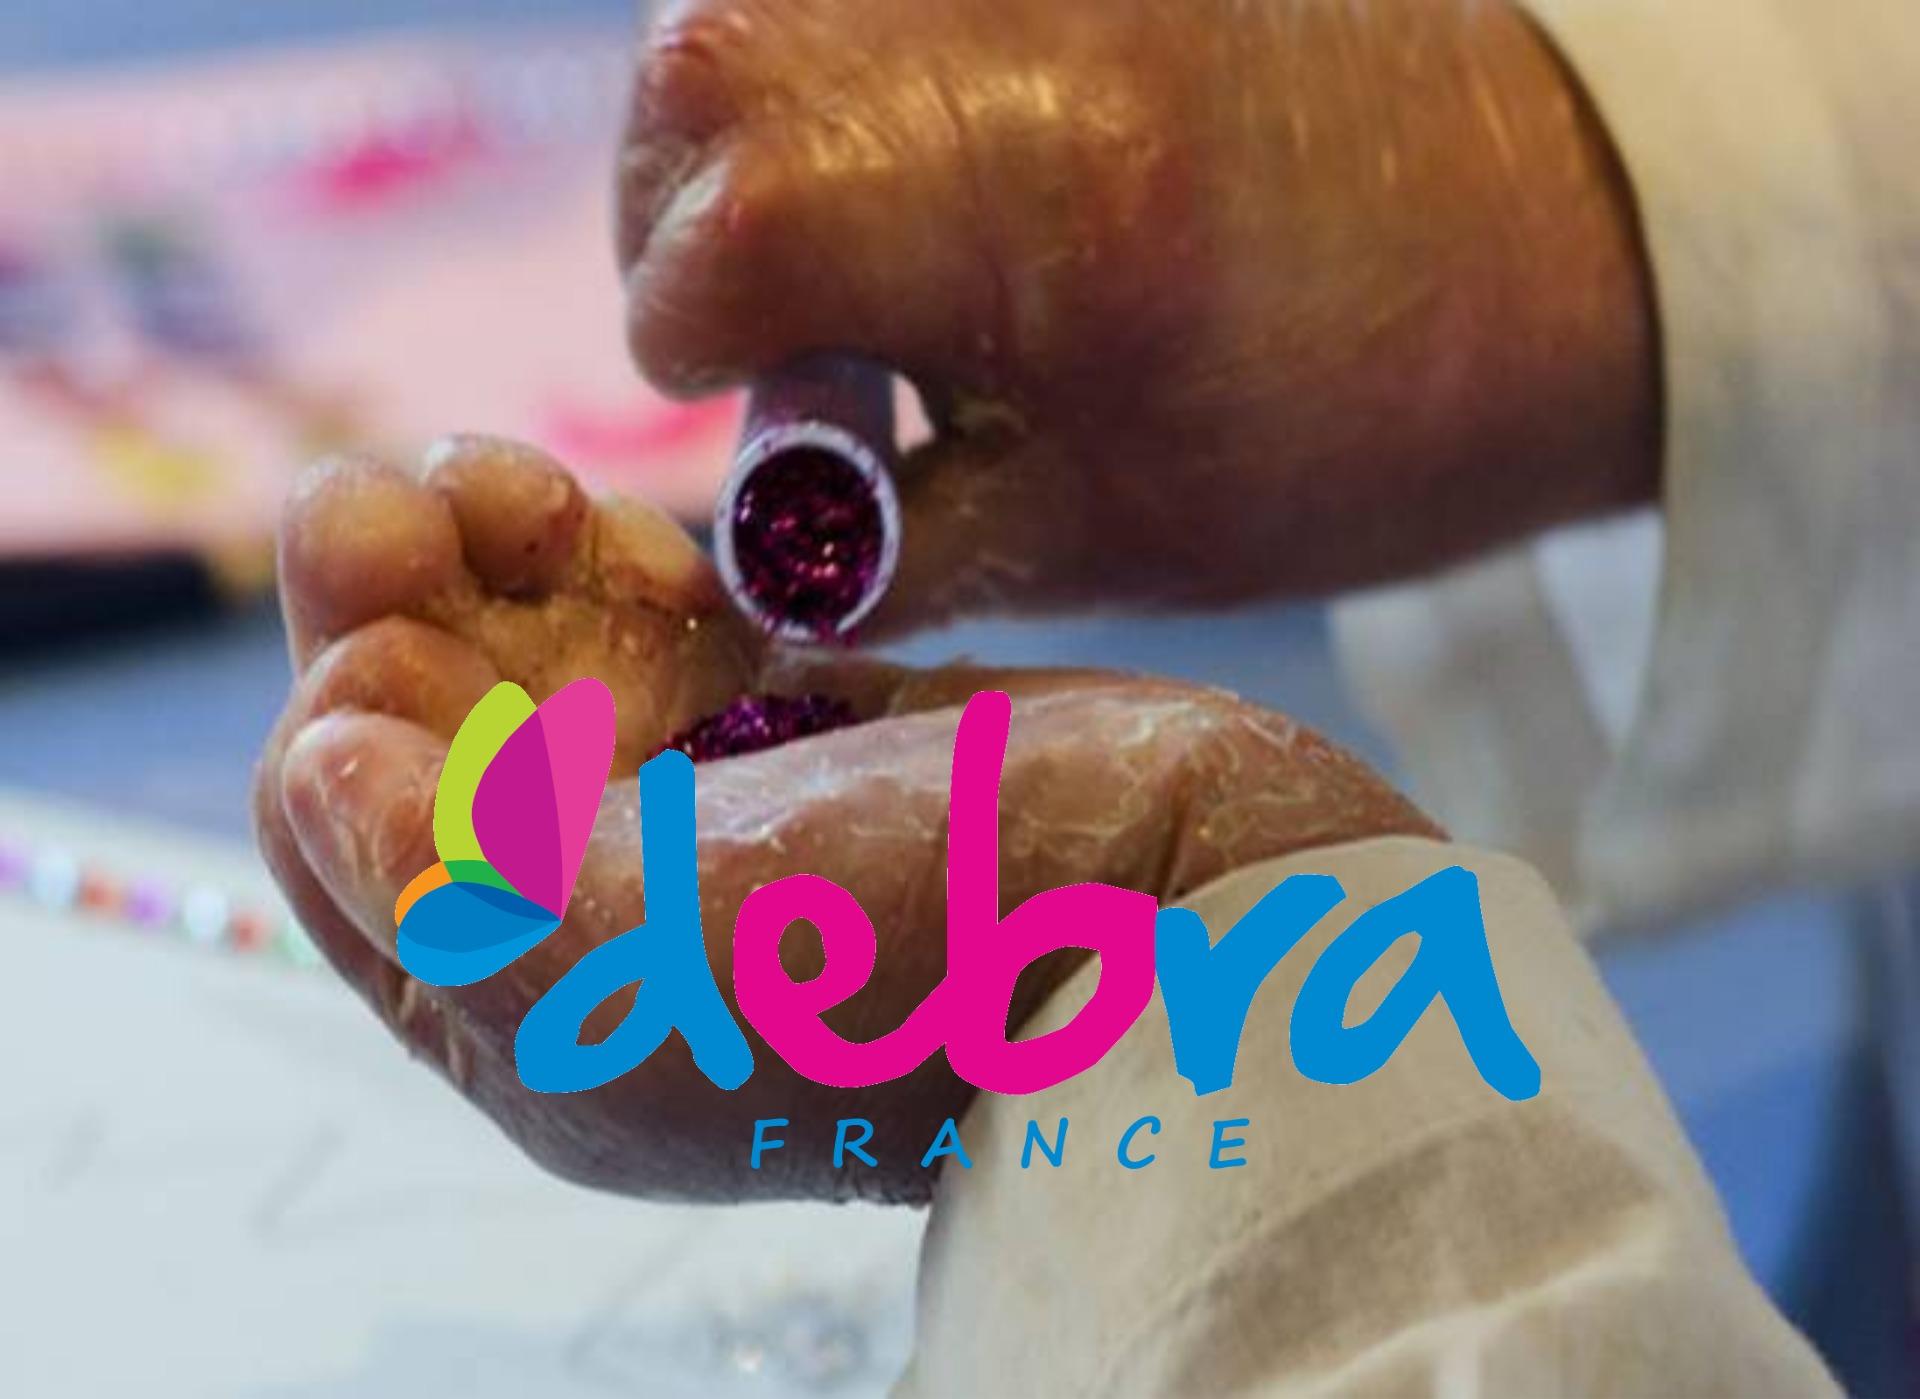 Debra France – Association Française de l'épidermolyse bulleuse